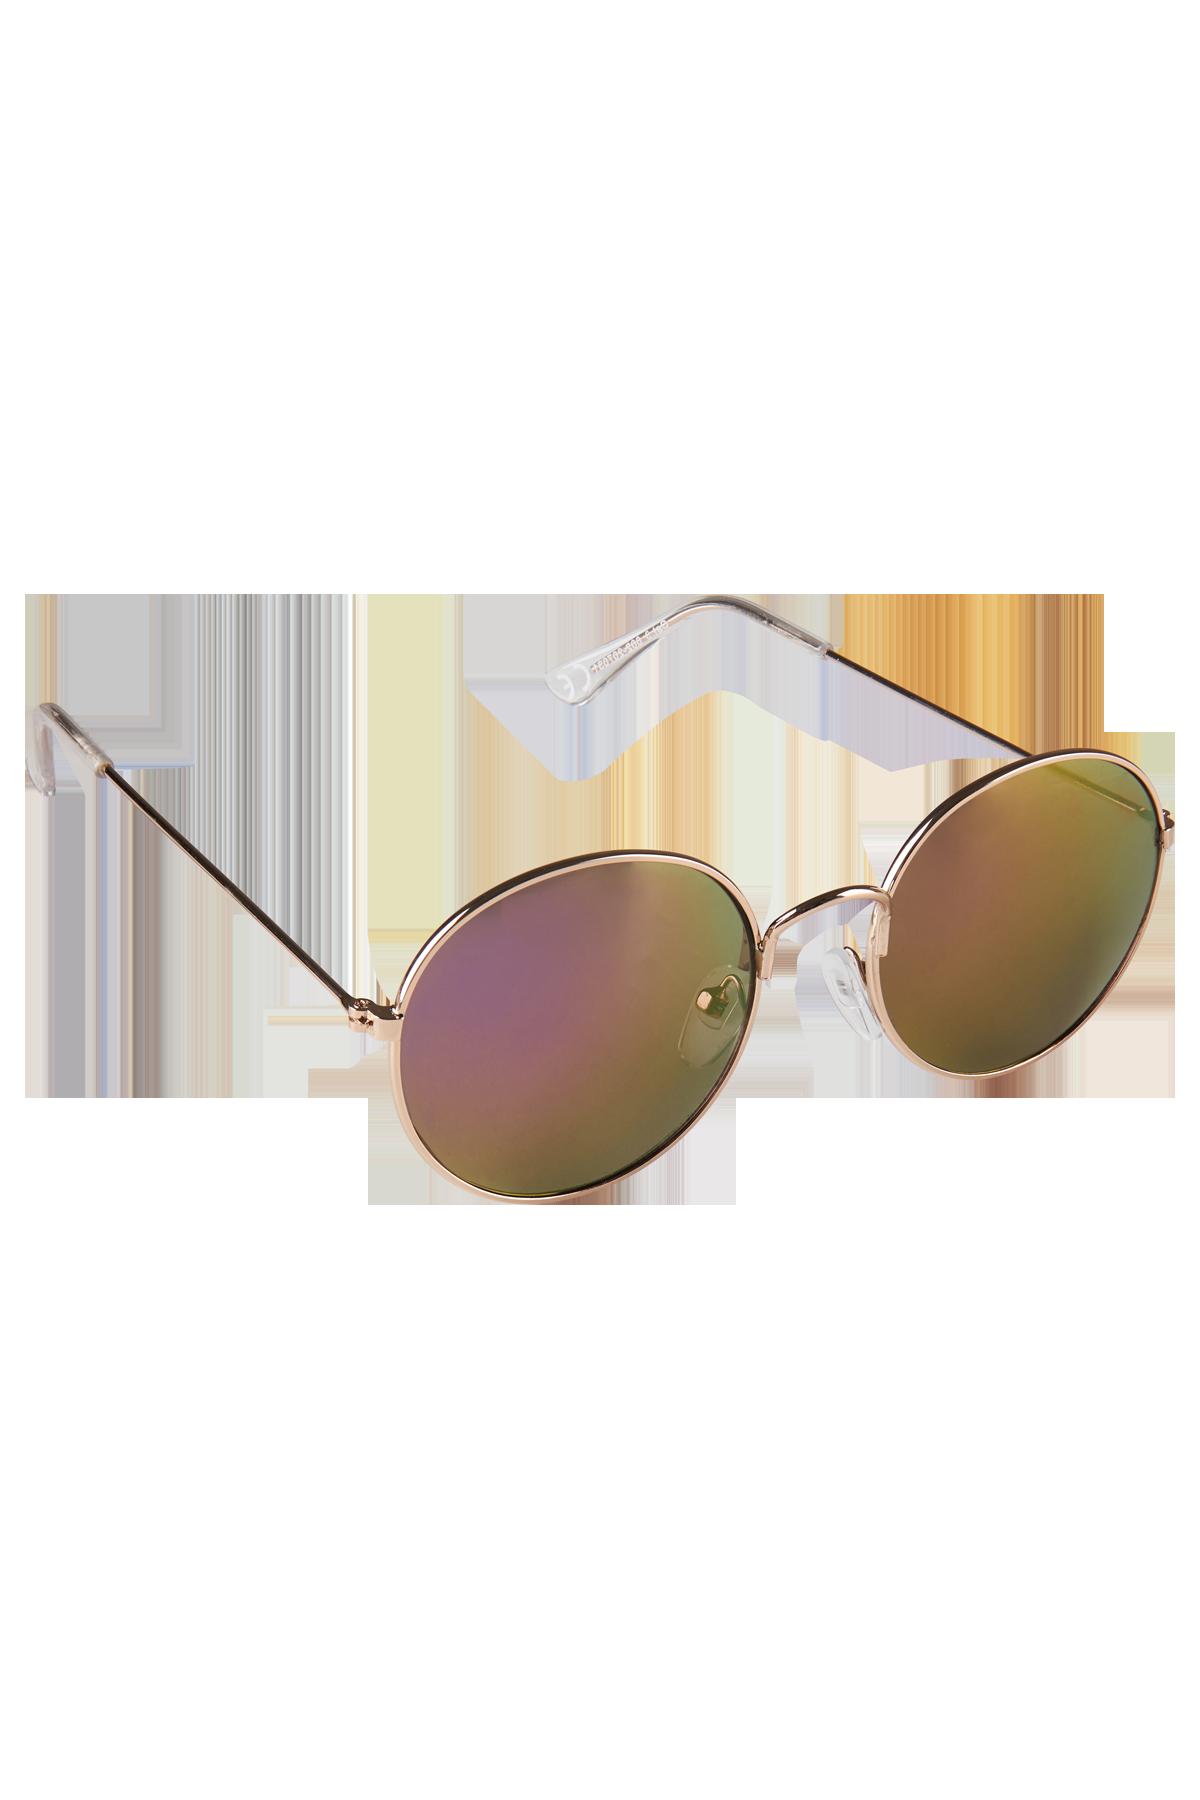 Sun glasses Tara